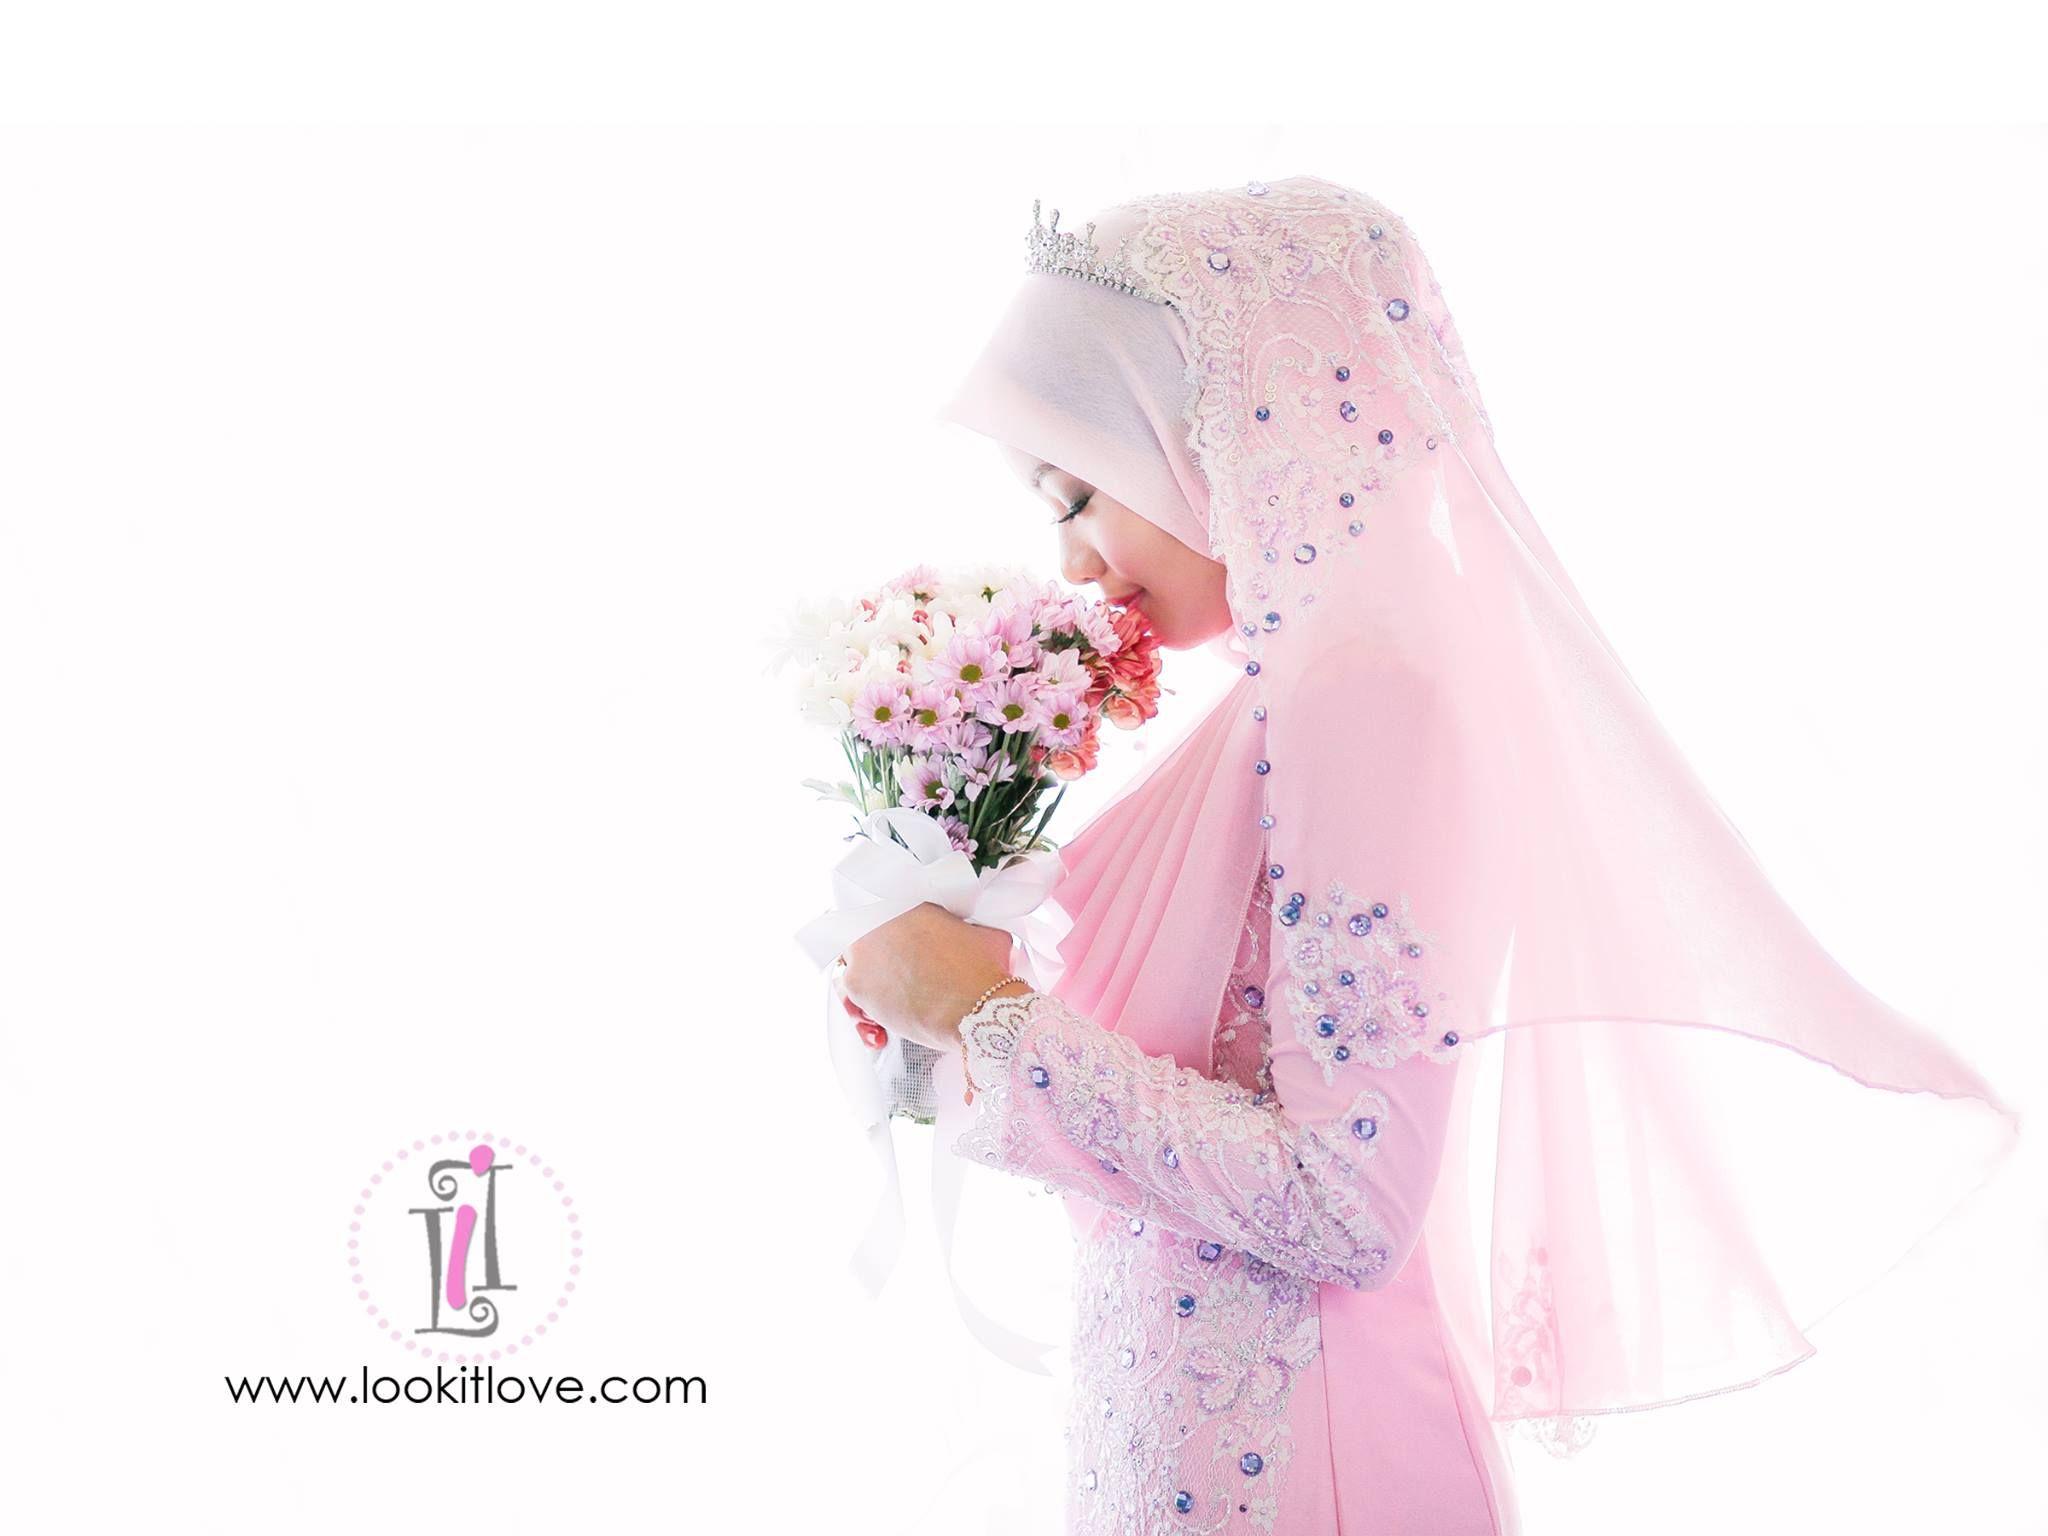 muslim bride | Wedding Dress Ideas for Muslimah | Pinterest